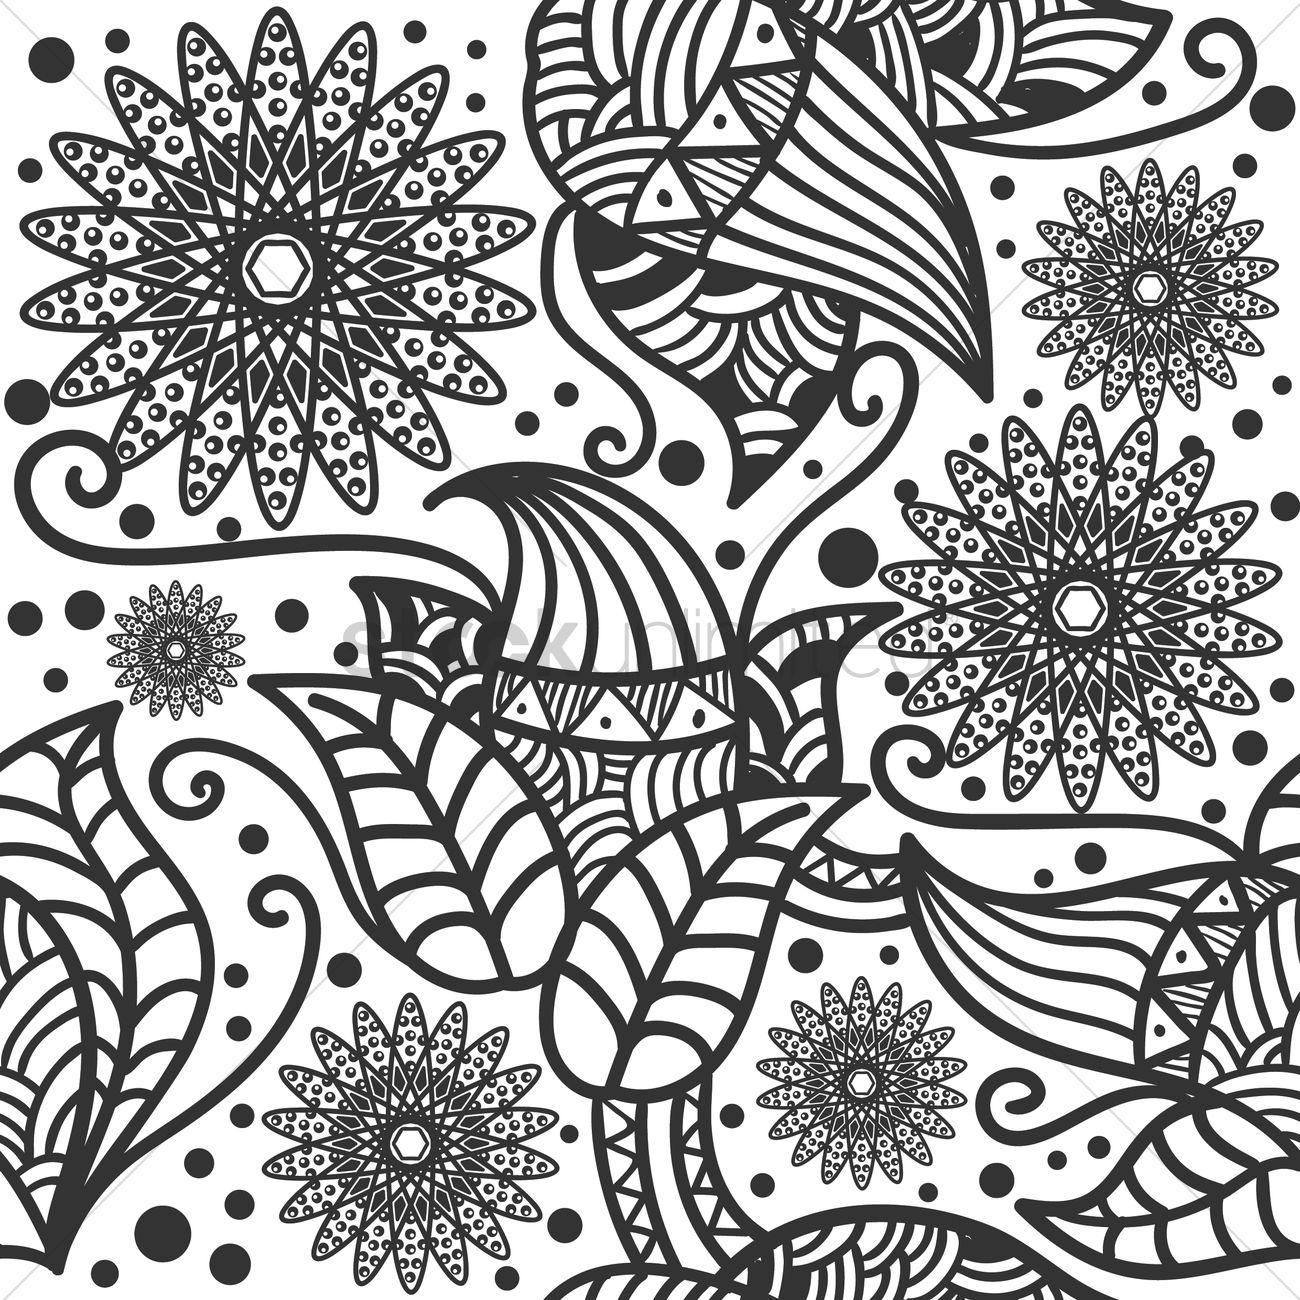 Decorative Flower Wallpaper Vector Image 1571510 Stockunlimited